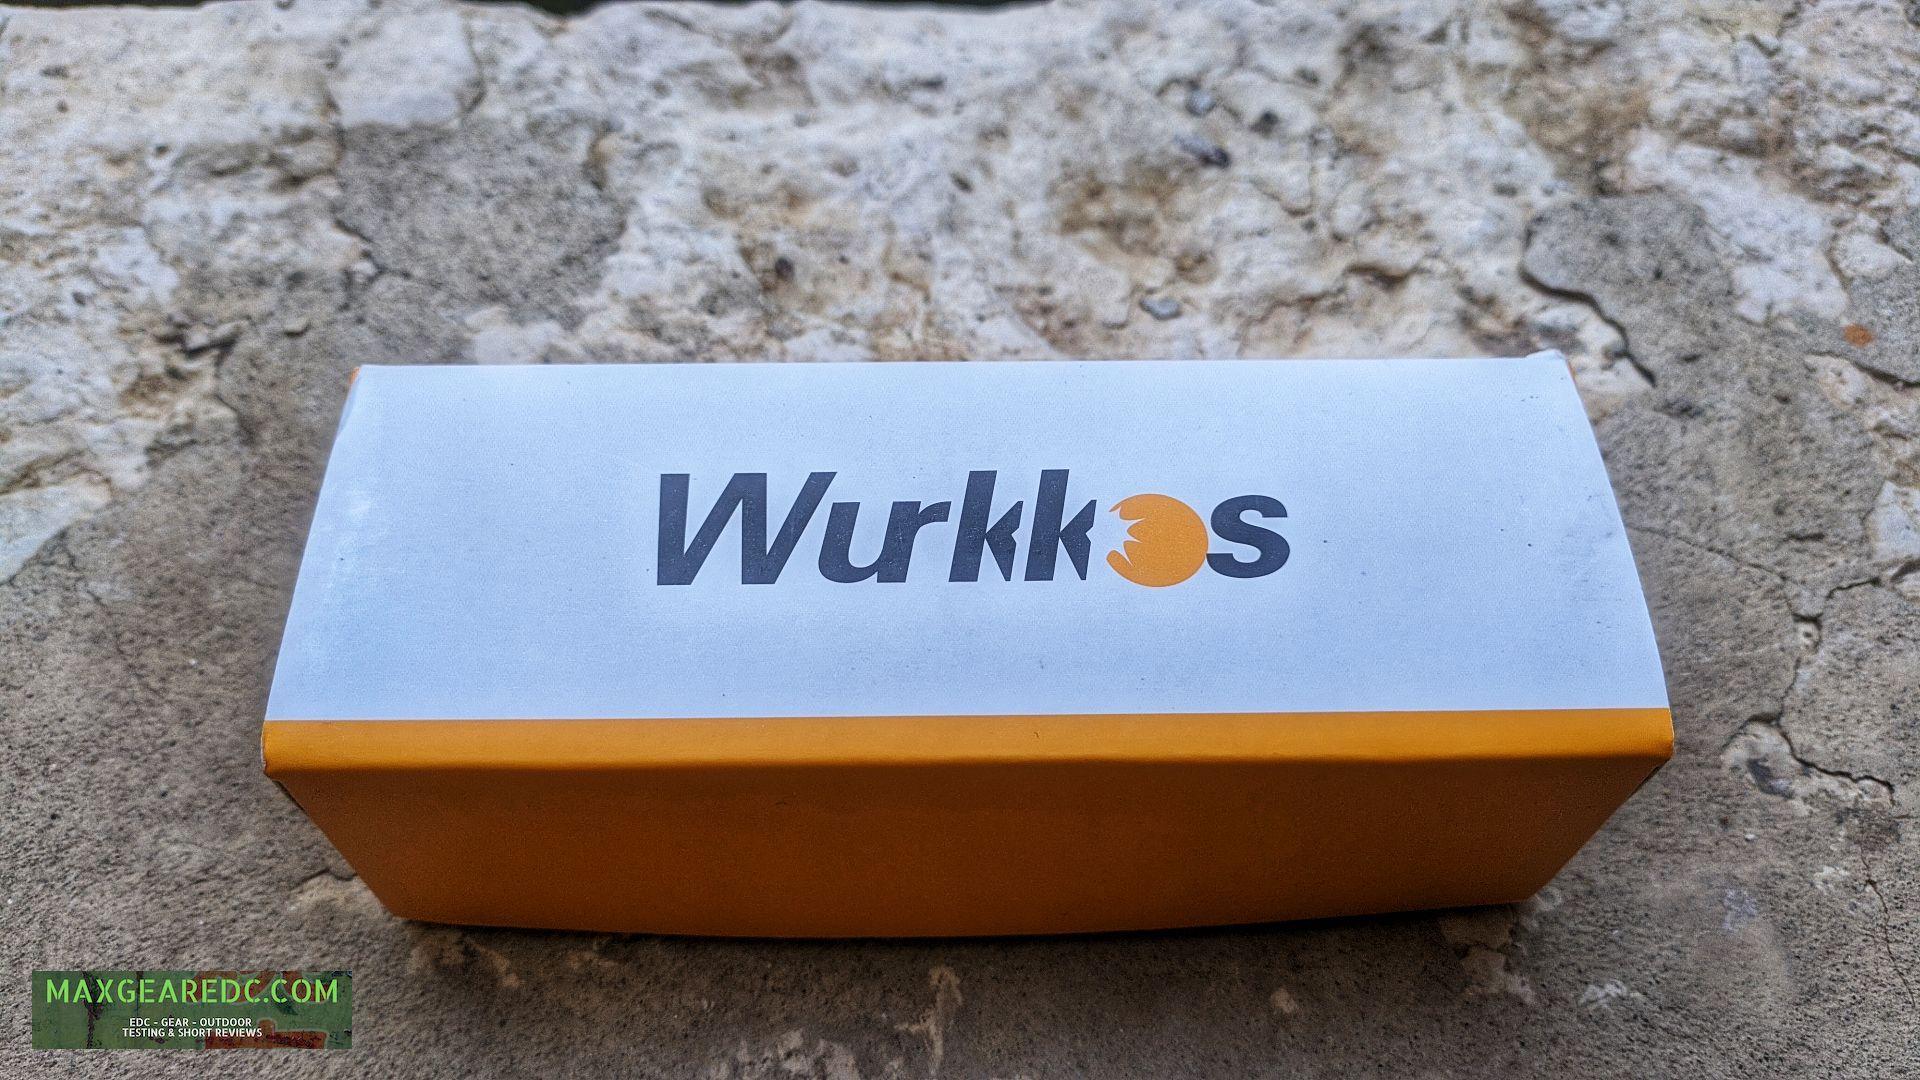 Wurkkos_FC11_EDC_Flashlight_Review_Aluminium_18650_maxgearedc.com_EDC_GEAR_OUTDOOR_TESTING_and_SHORT_REVIEWS_3